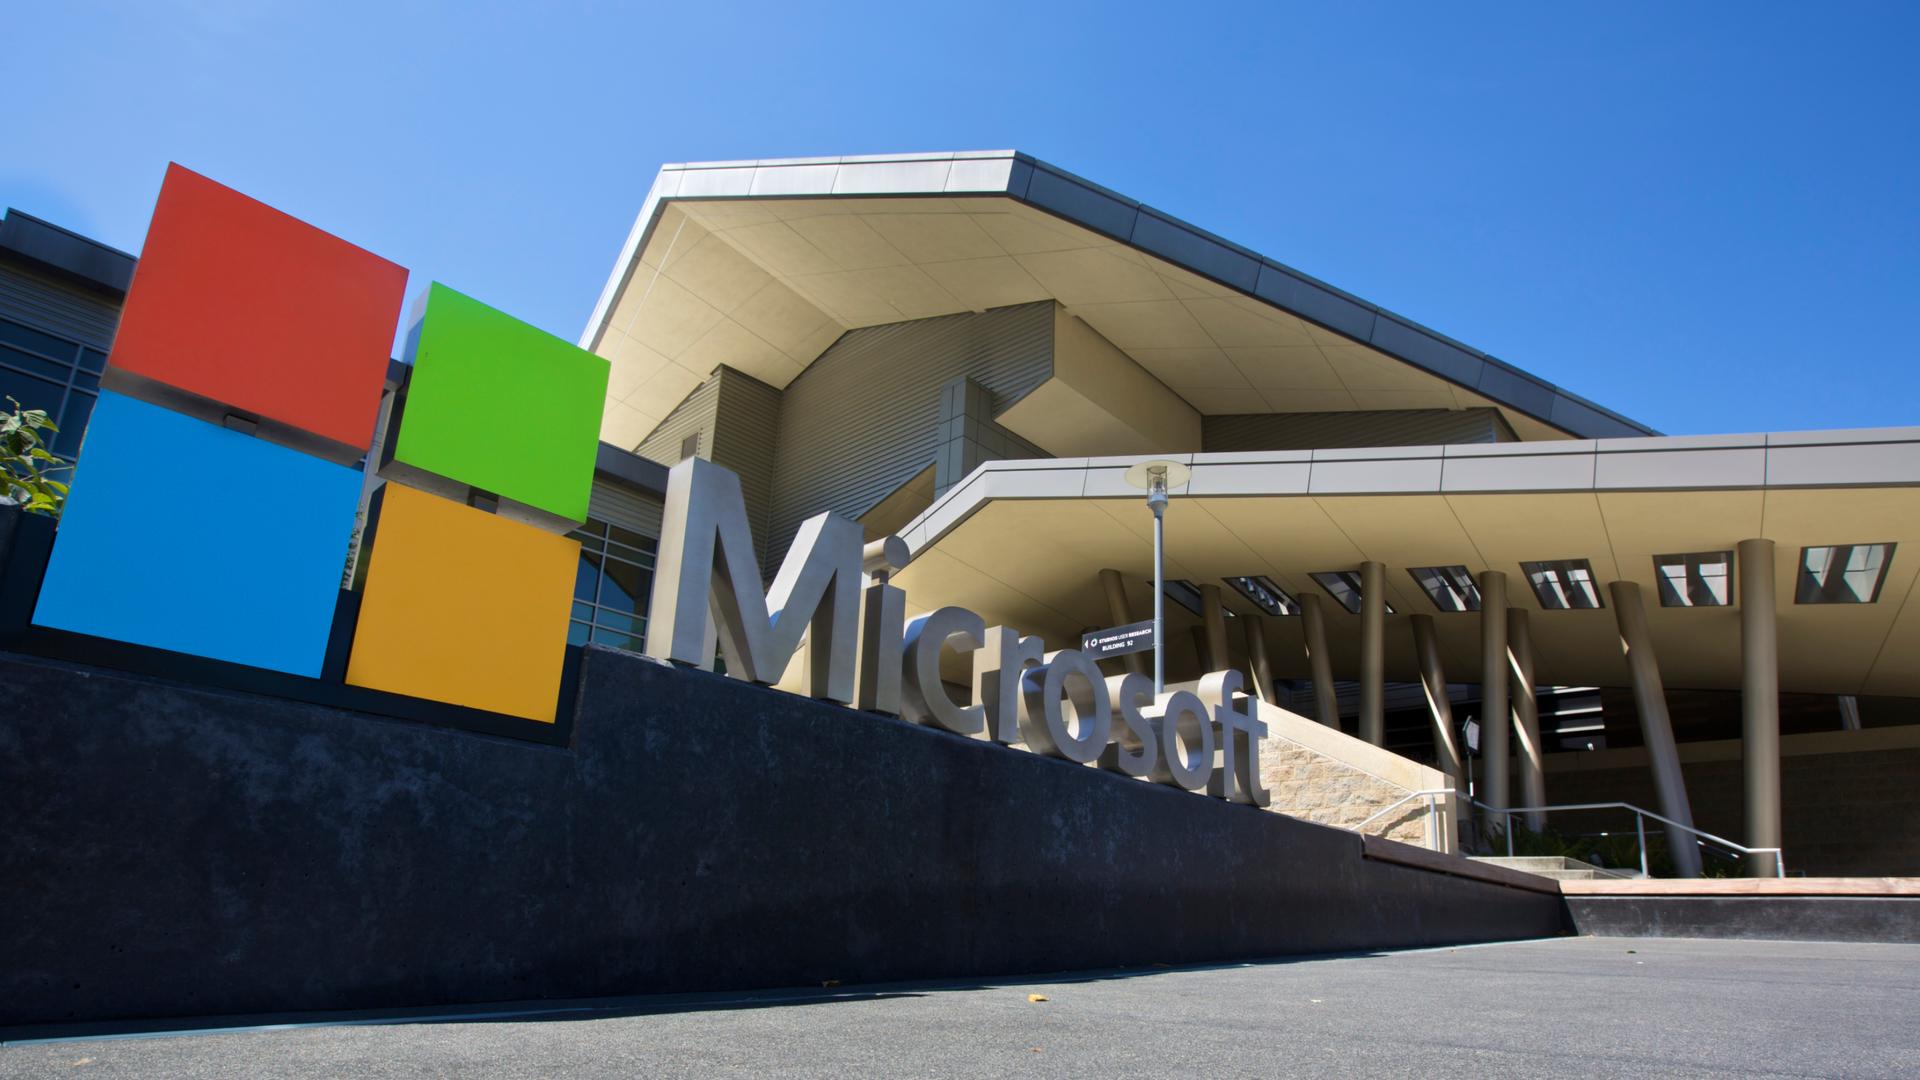 A Microsoft office